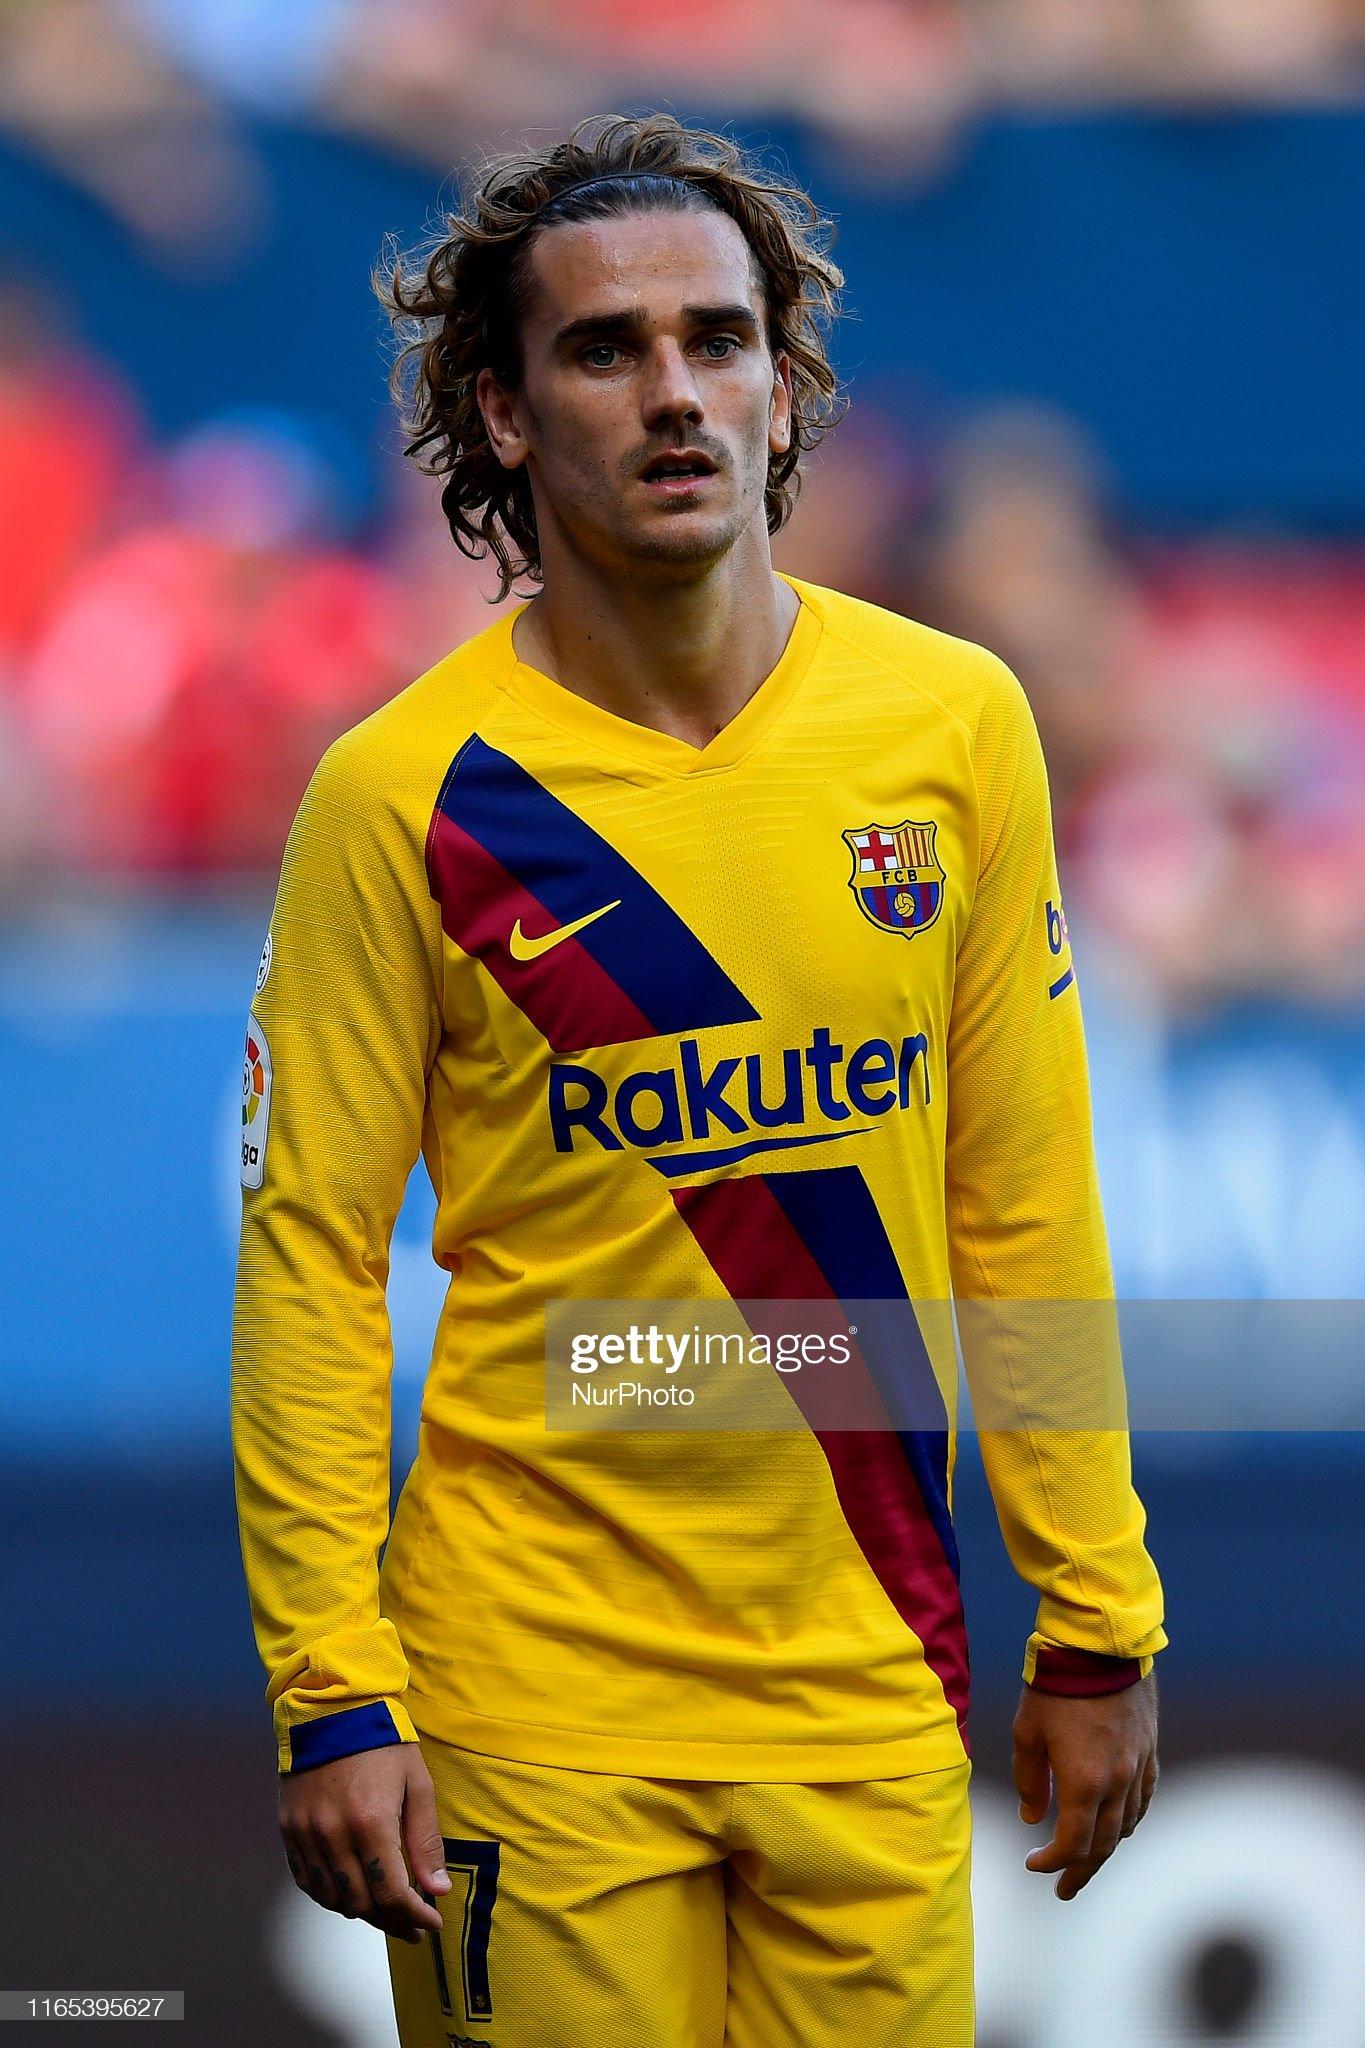 صور مباراة : أوساسونا - برشلونة 2-2 ( 31-08-2019 )  Antoine-griezmann-of-barcelona-during-the-liga-match-between-ca-and-picture-id1165395627?s=2048x2048